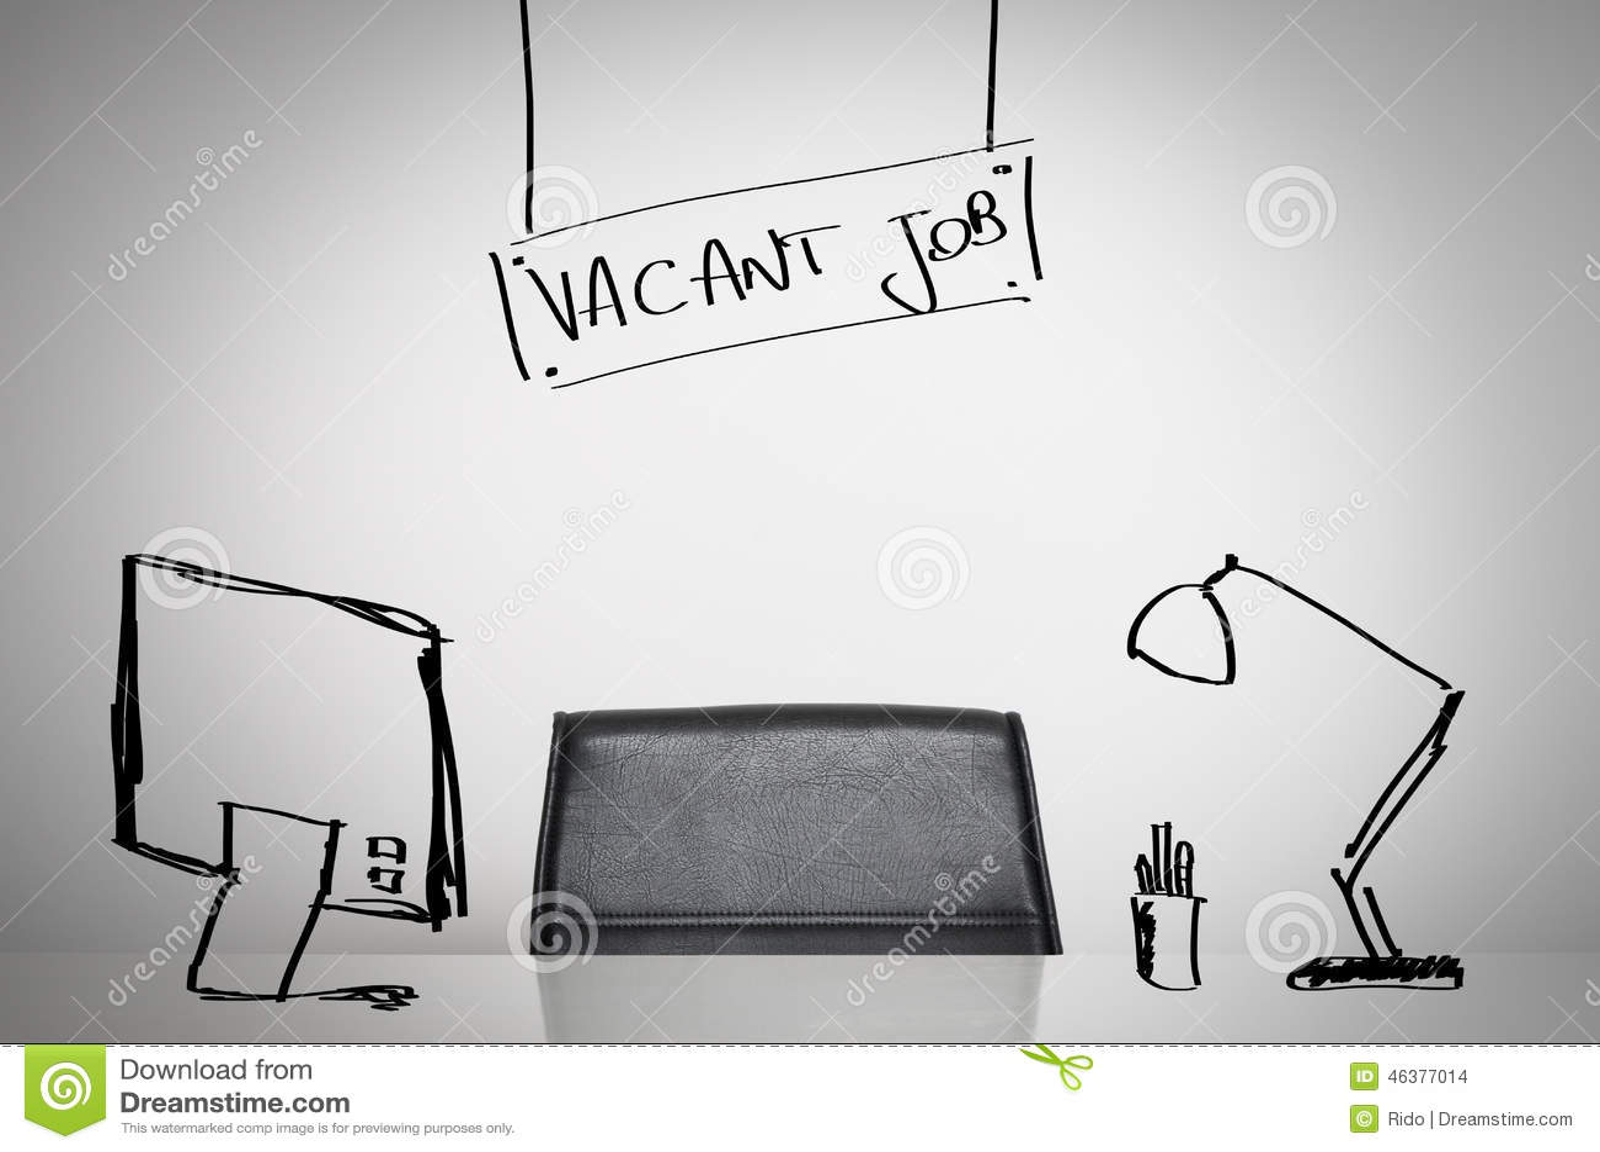 Vacant Job Stock Photo  Image 46377014